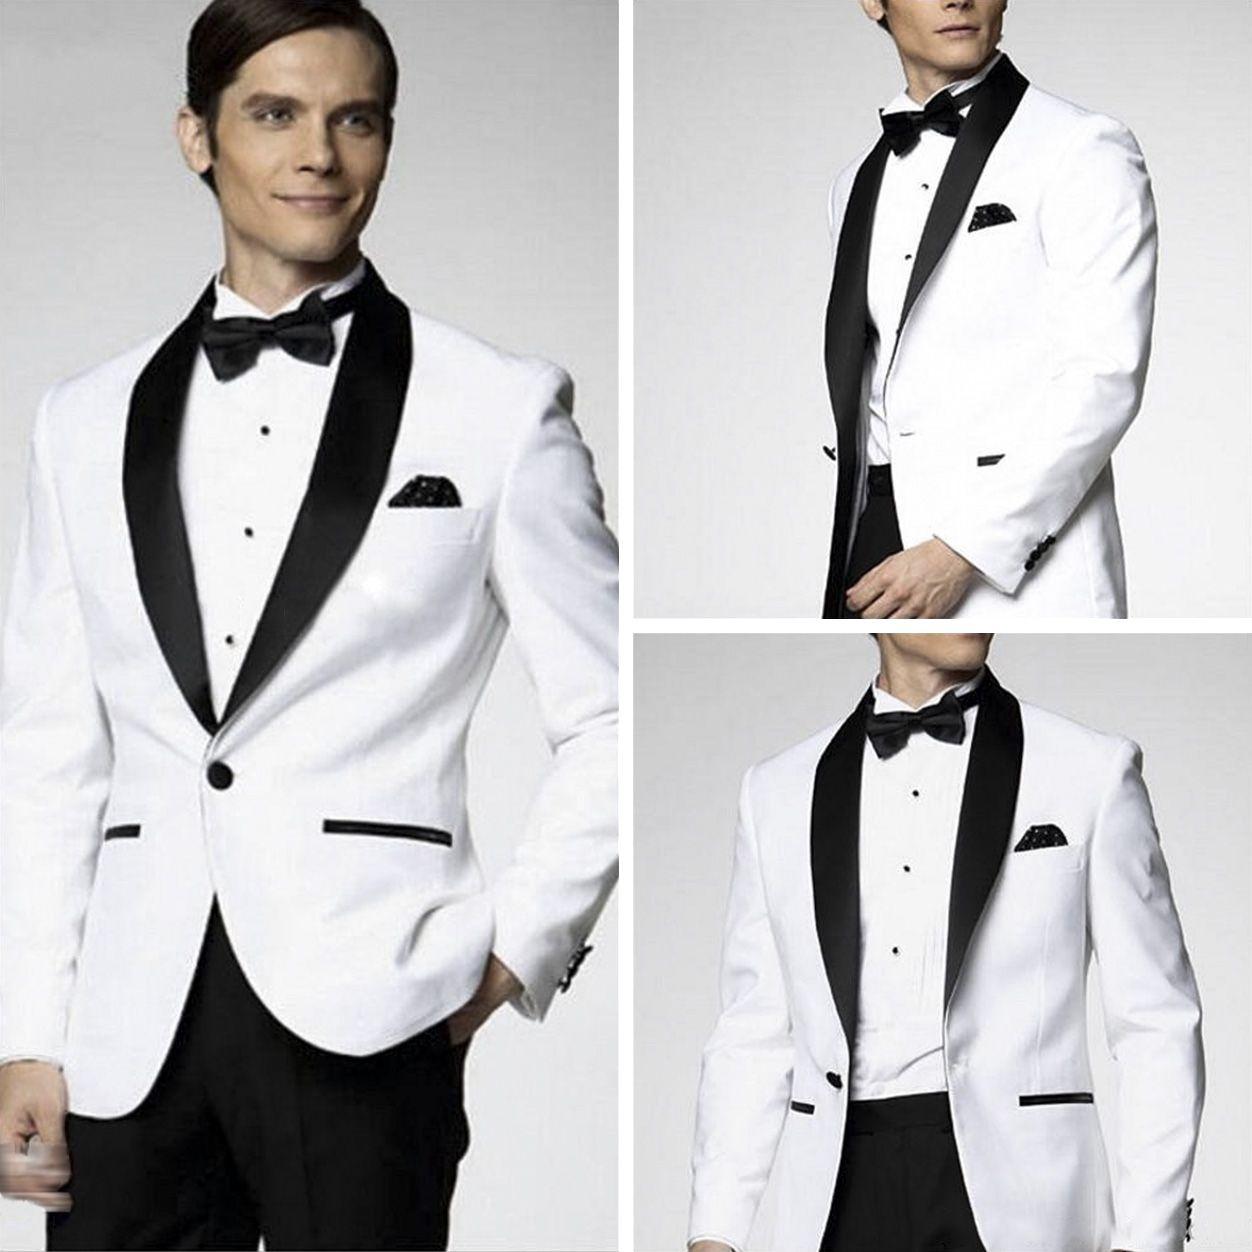 New Arrival White Tuxedo Dinner Suit Jacket Black Shawl